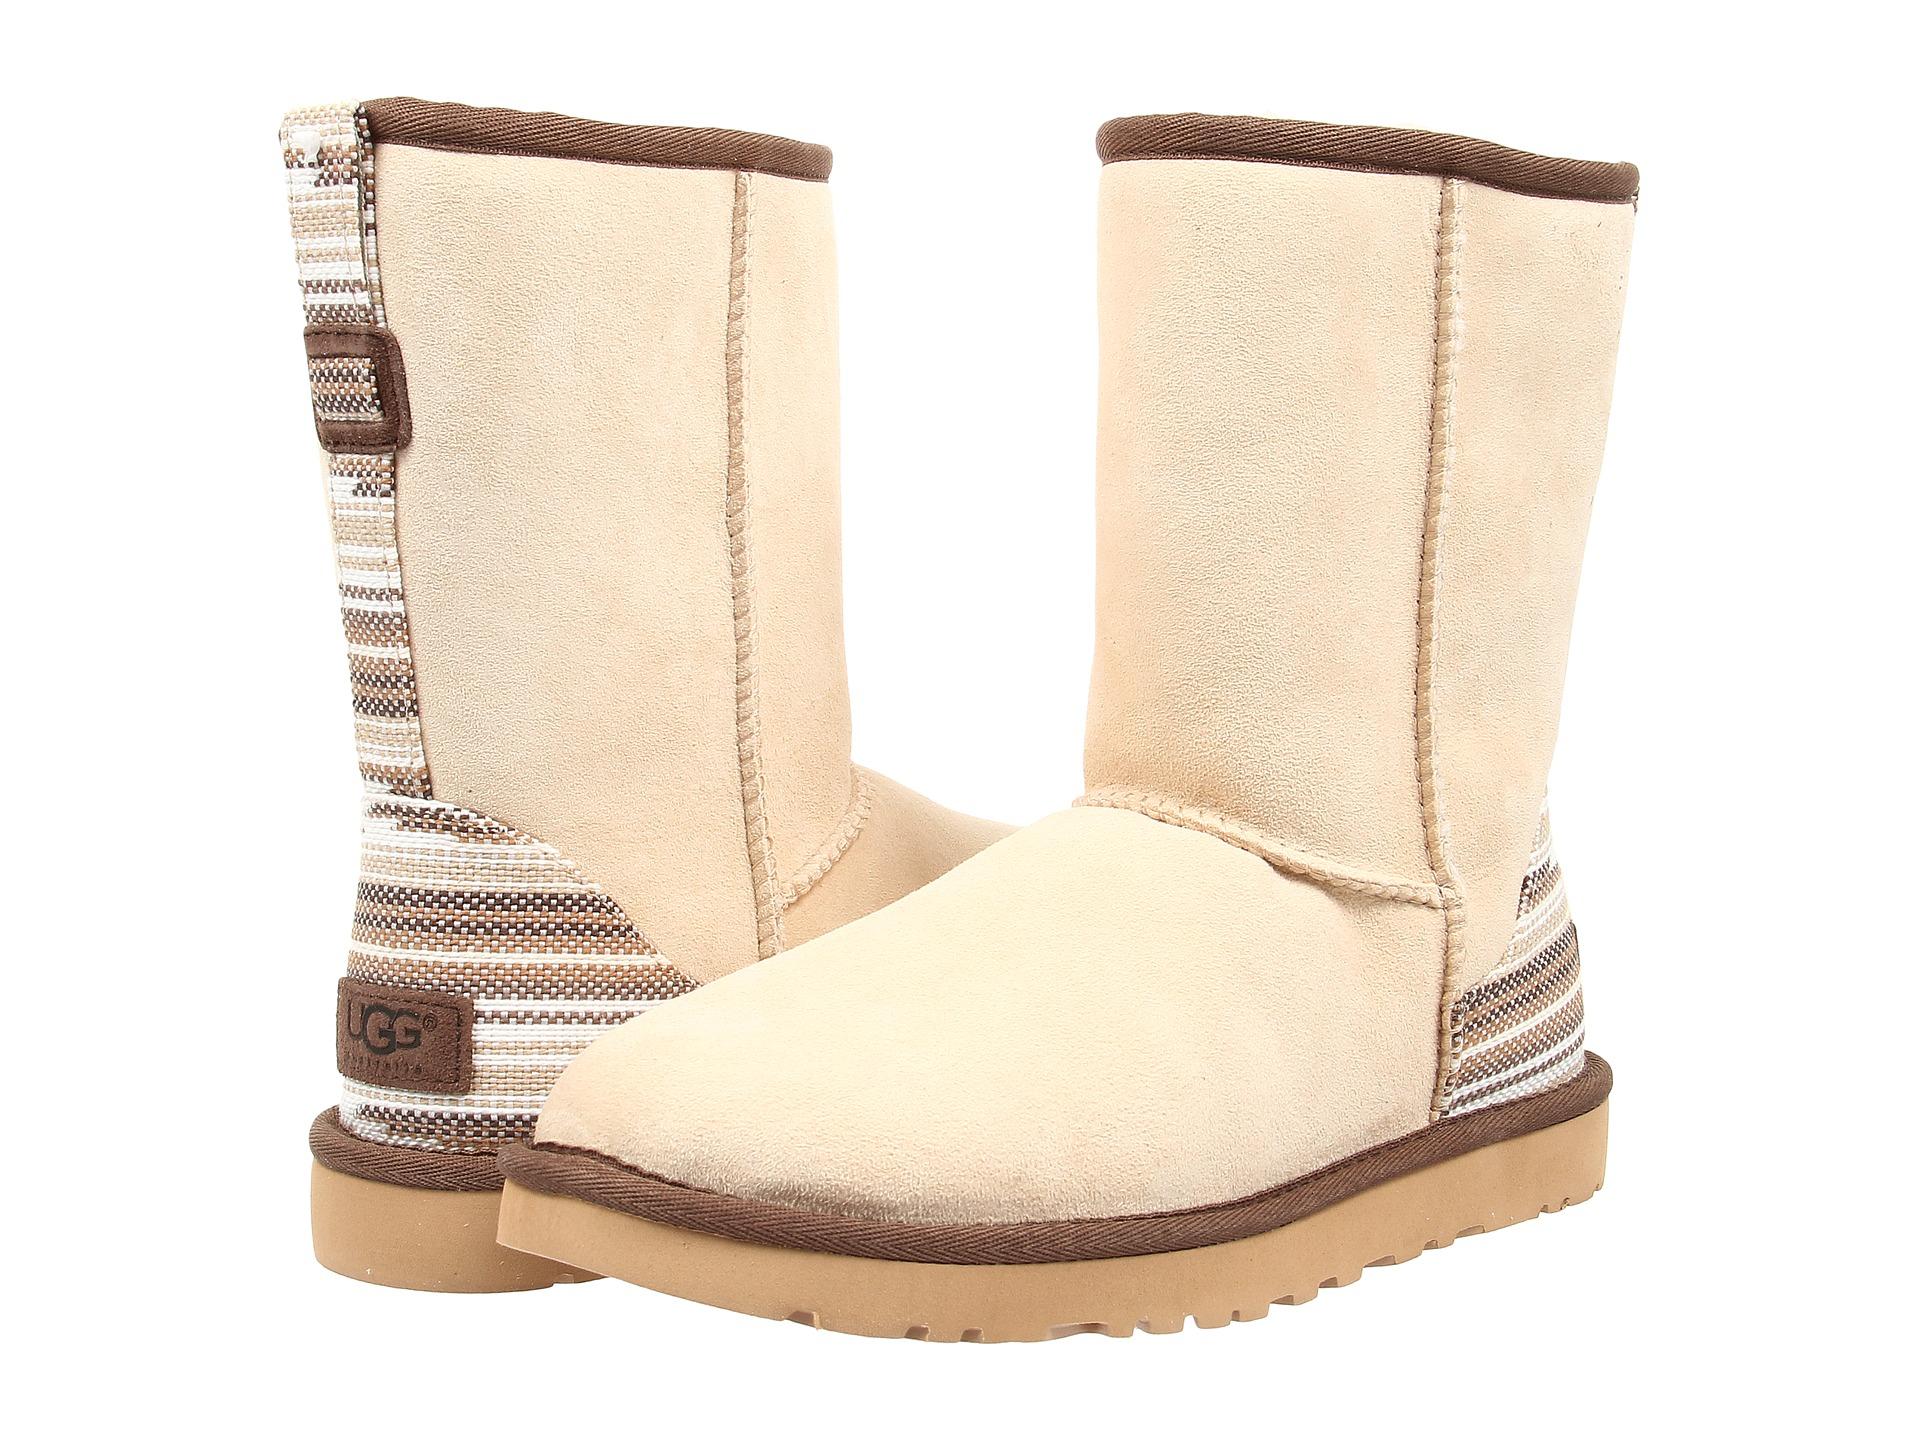 Womens Boots UGG Classic Short Serape Cream Twinface